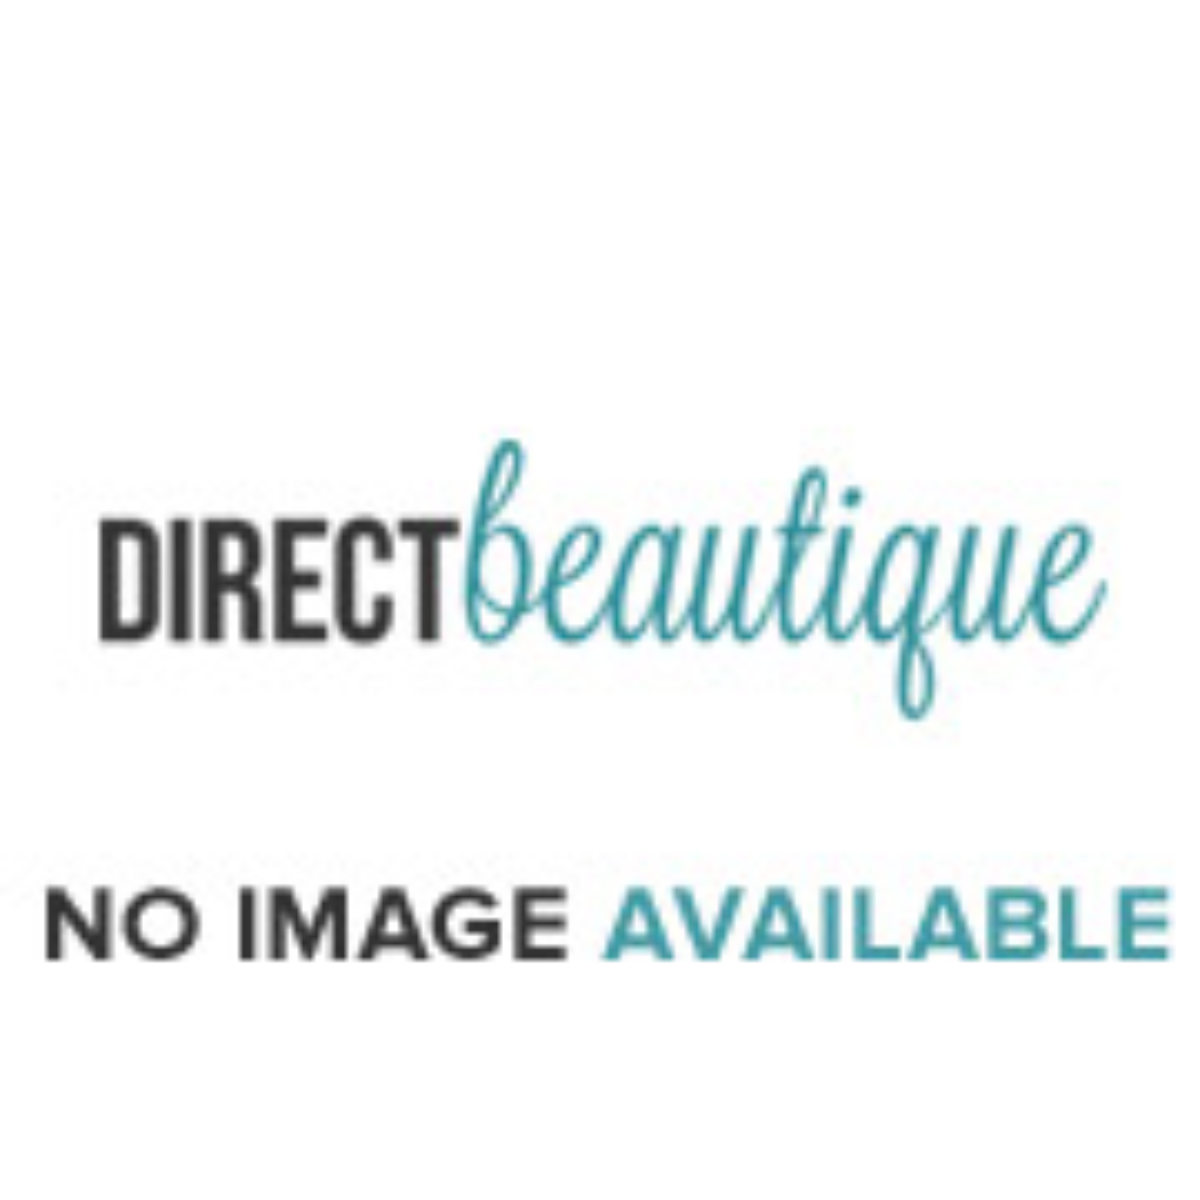 Dolce & Gabbana Dolce And Gabbana Light Blue Beauty In Capri EDT Spray 40ml